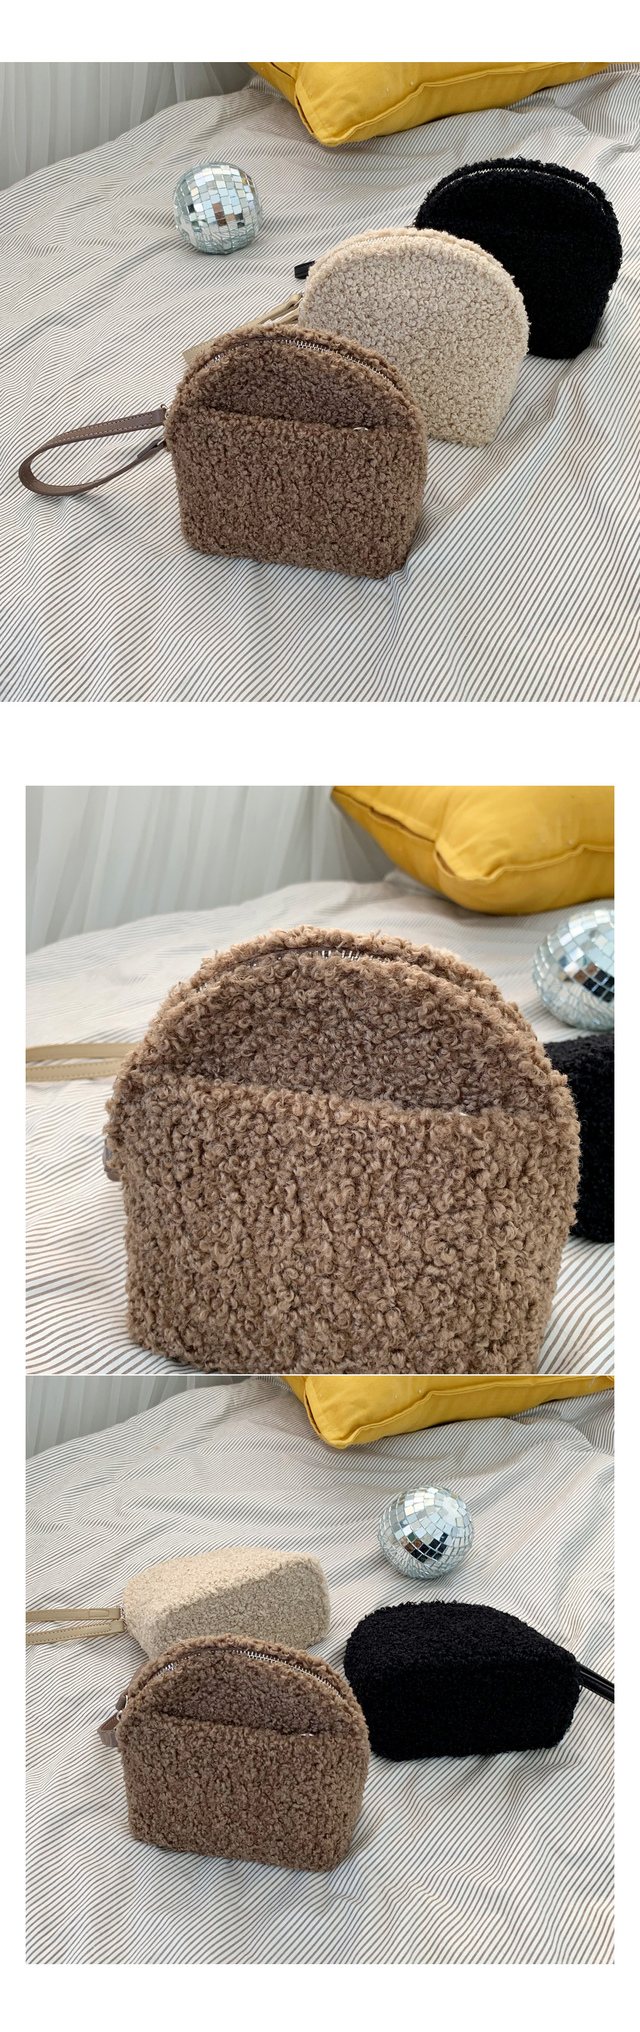 Mongle clutch bag